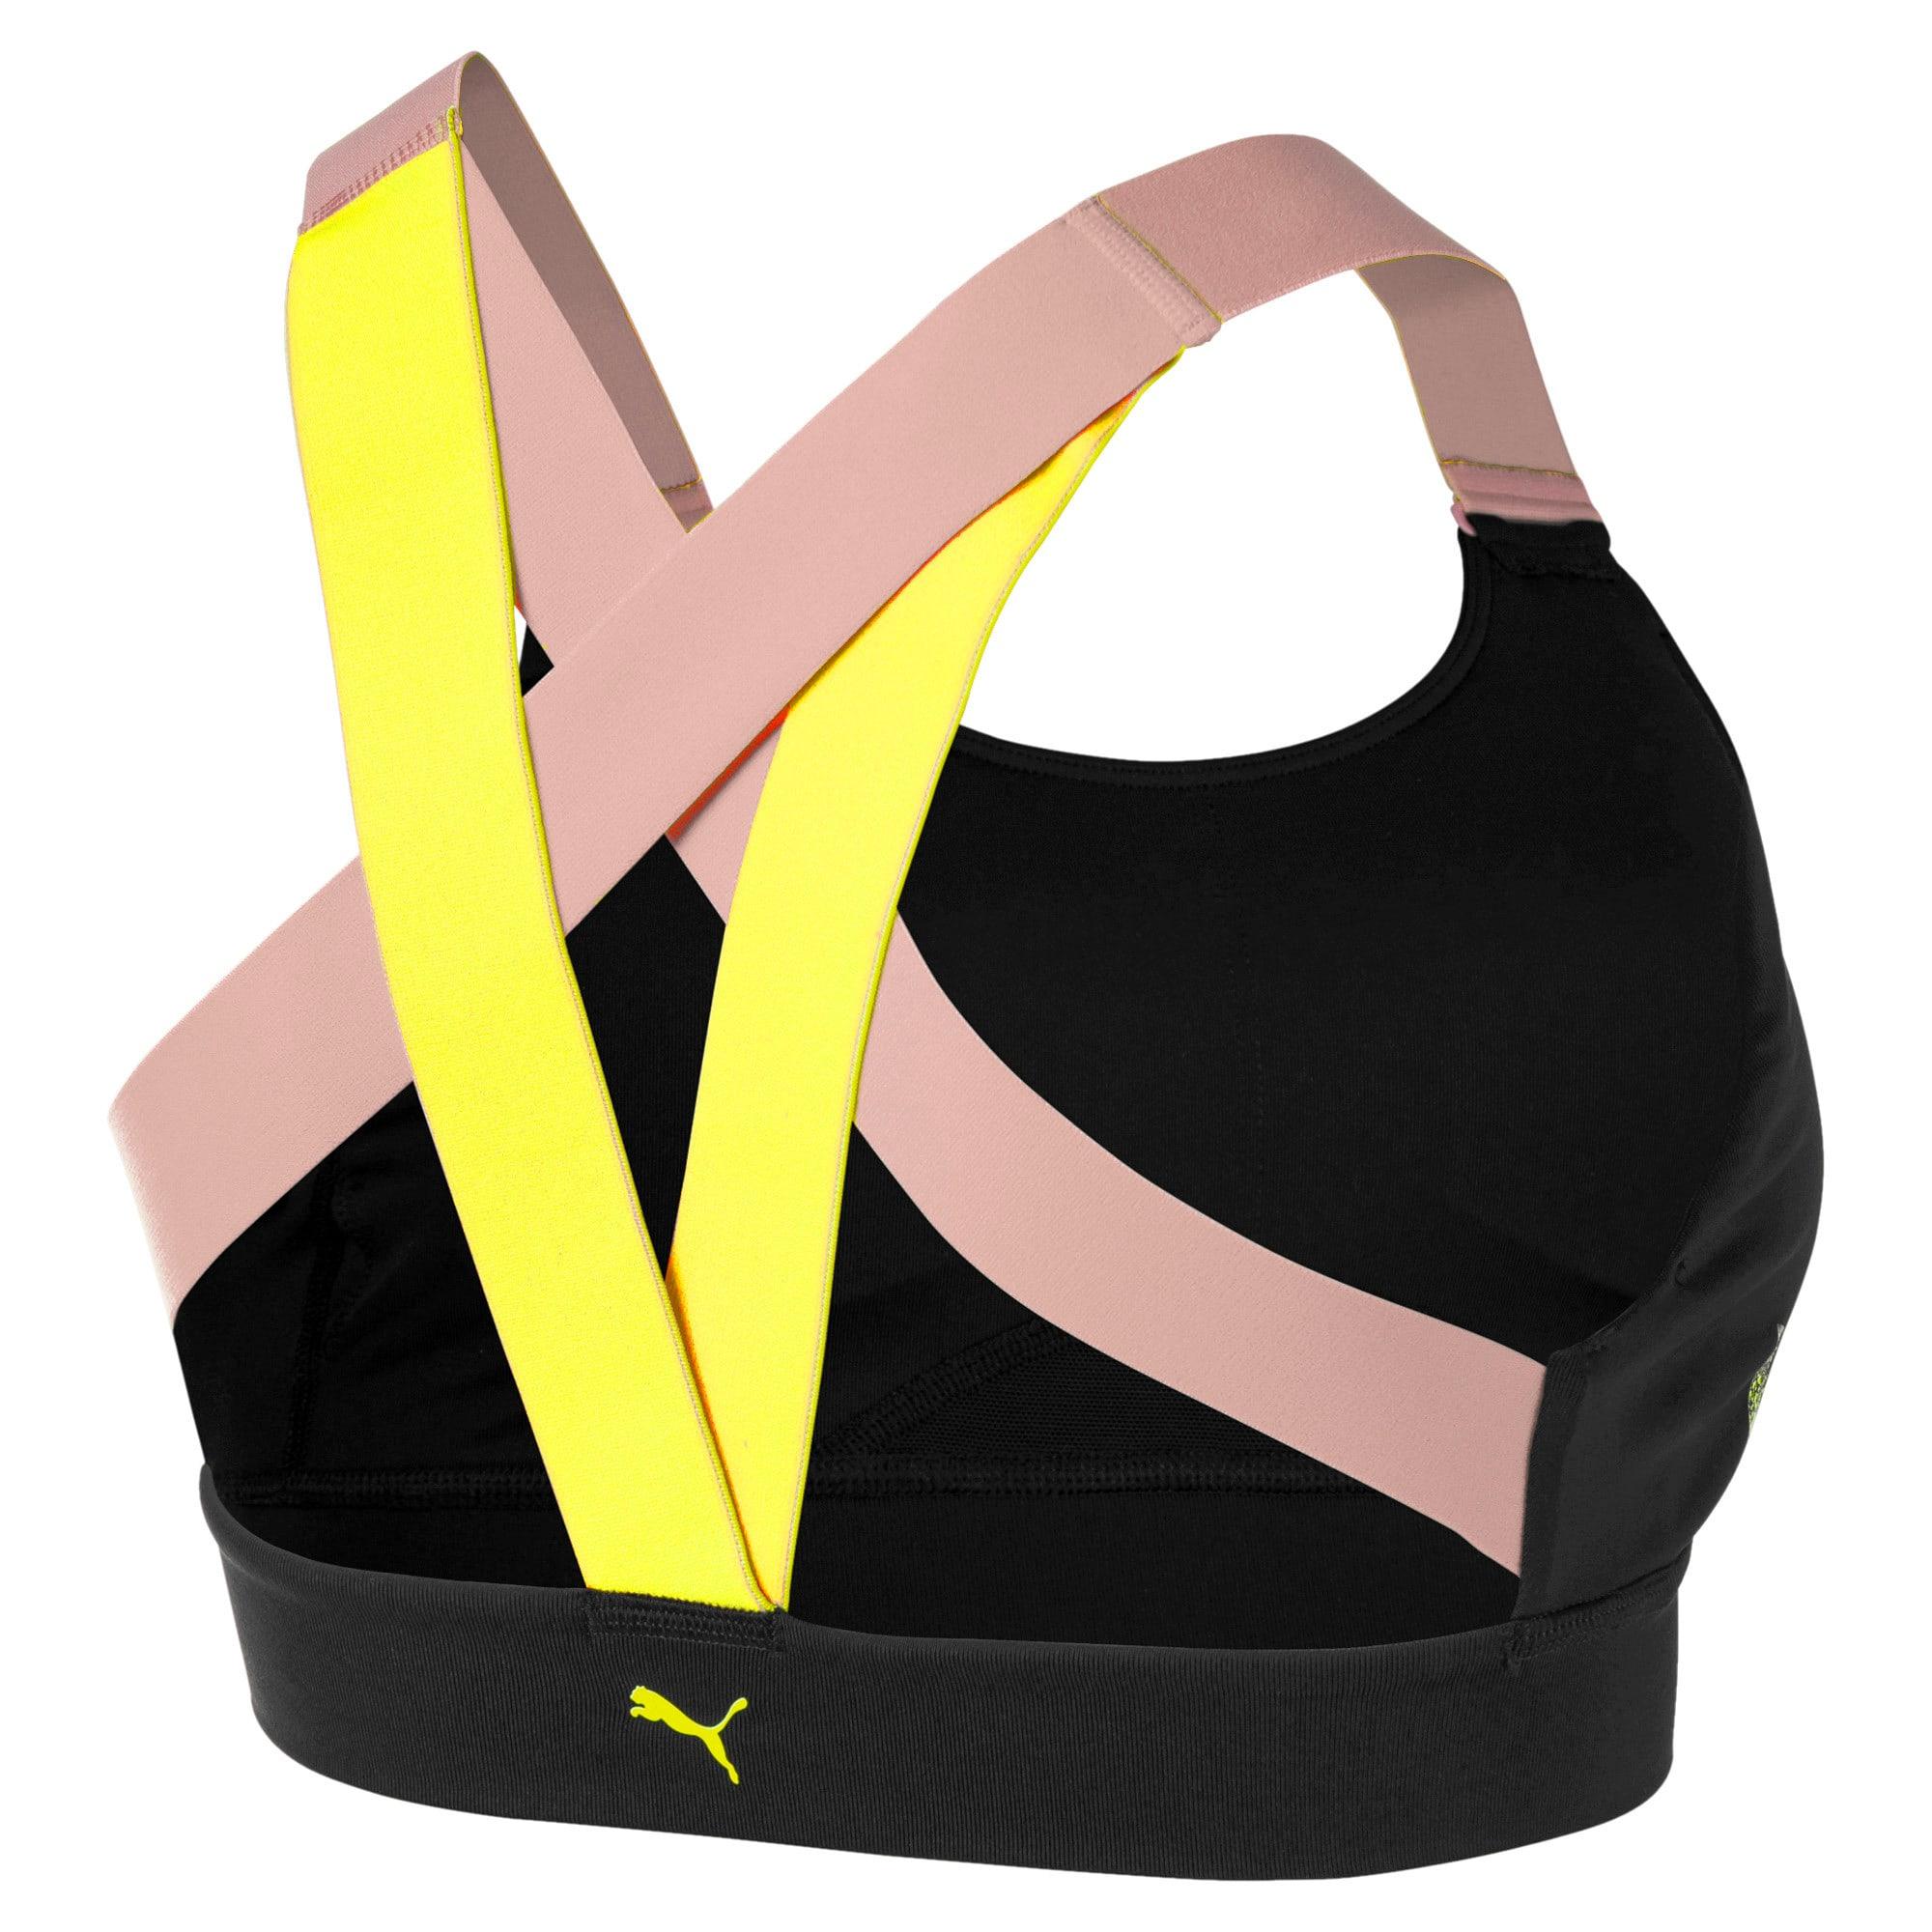 Thumbnail 5 of Feel It Women's Training Bra, Black-BridalRose-Yellowalert, medium